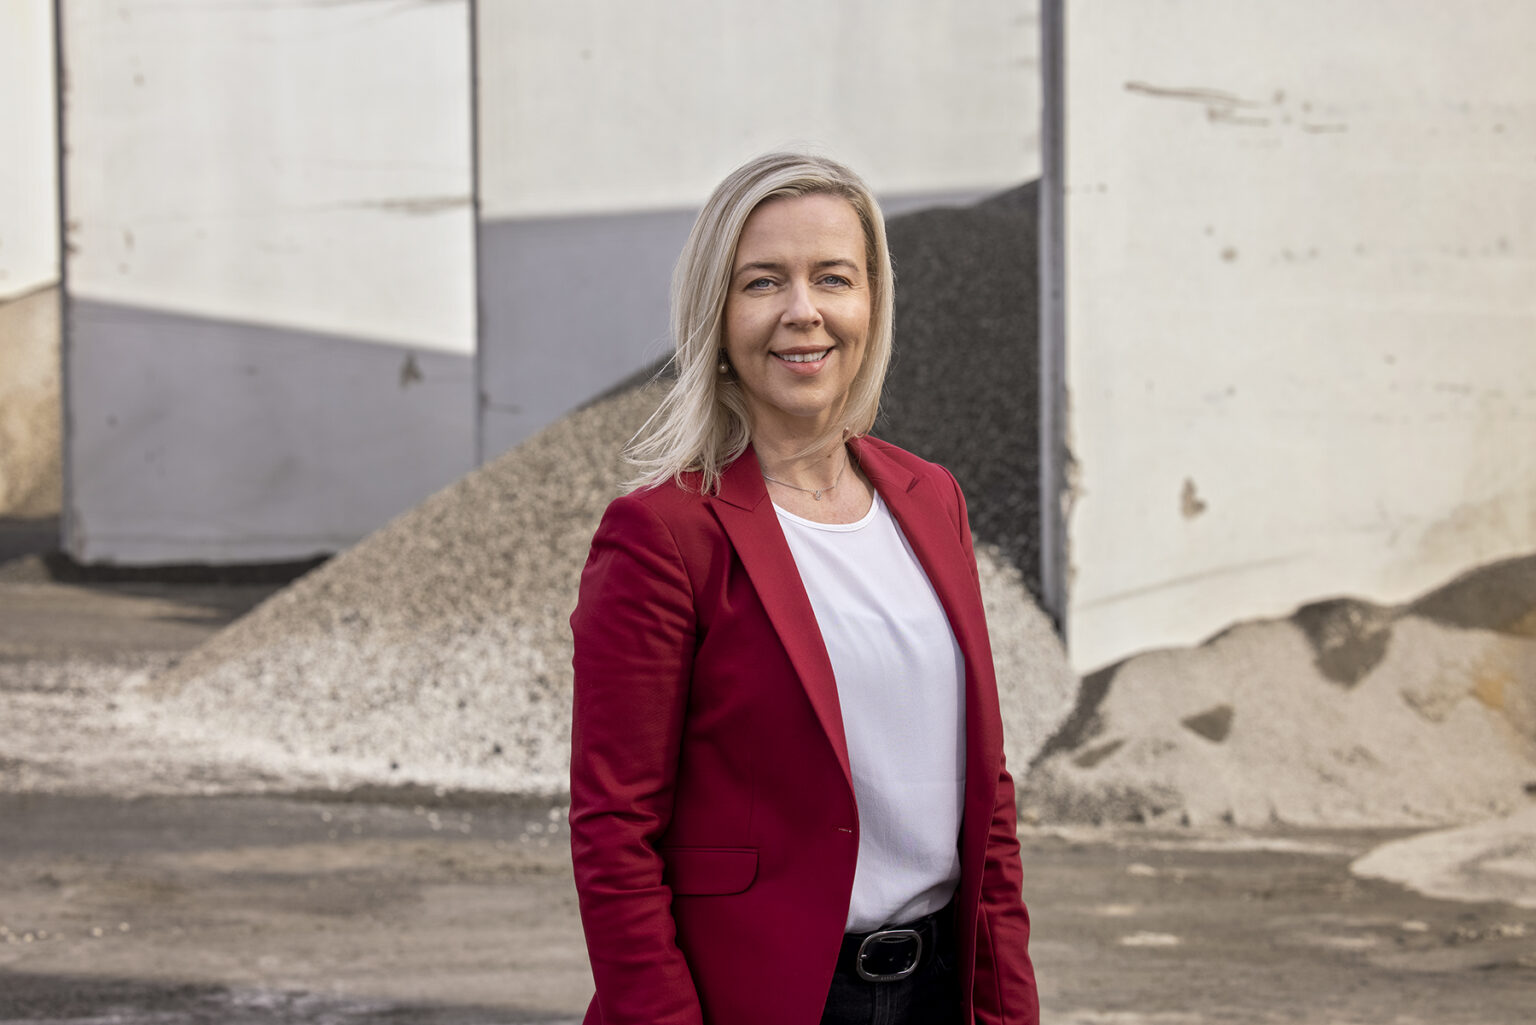 Lilja Samúelsdóttir